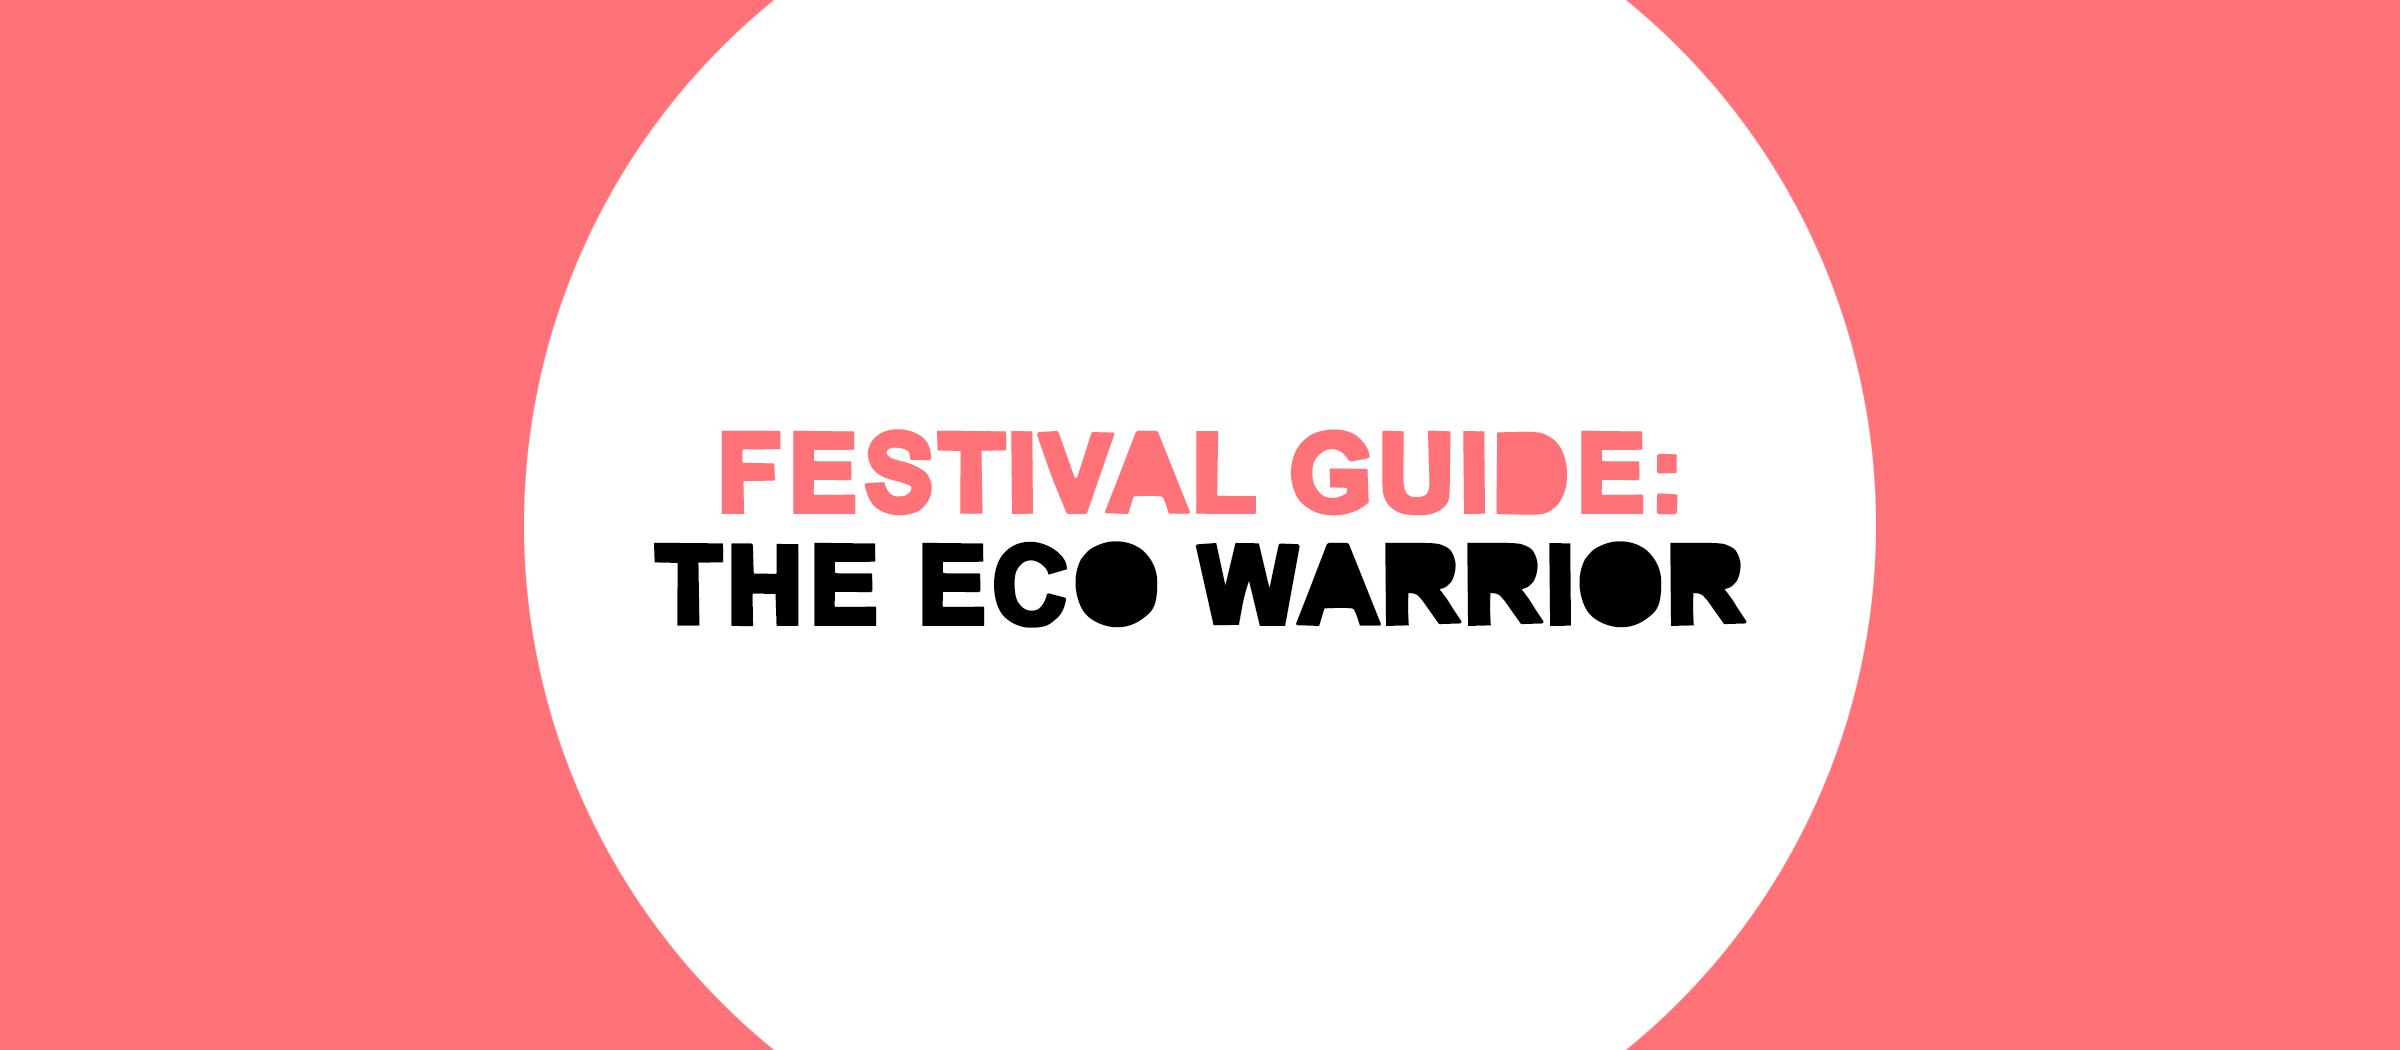 Festival Guide: The Eco Warrior